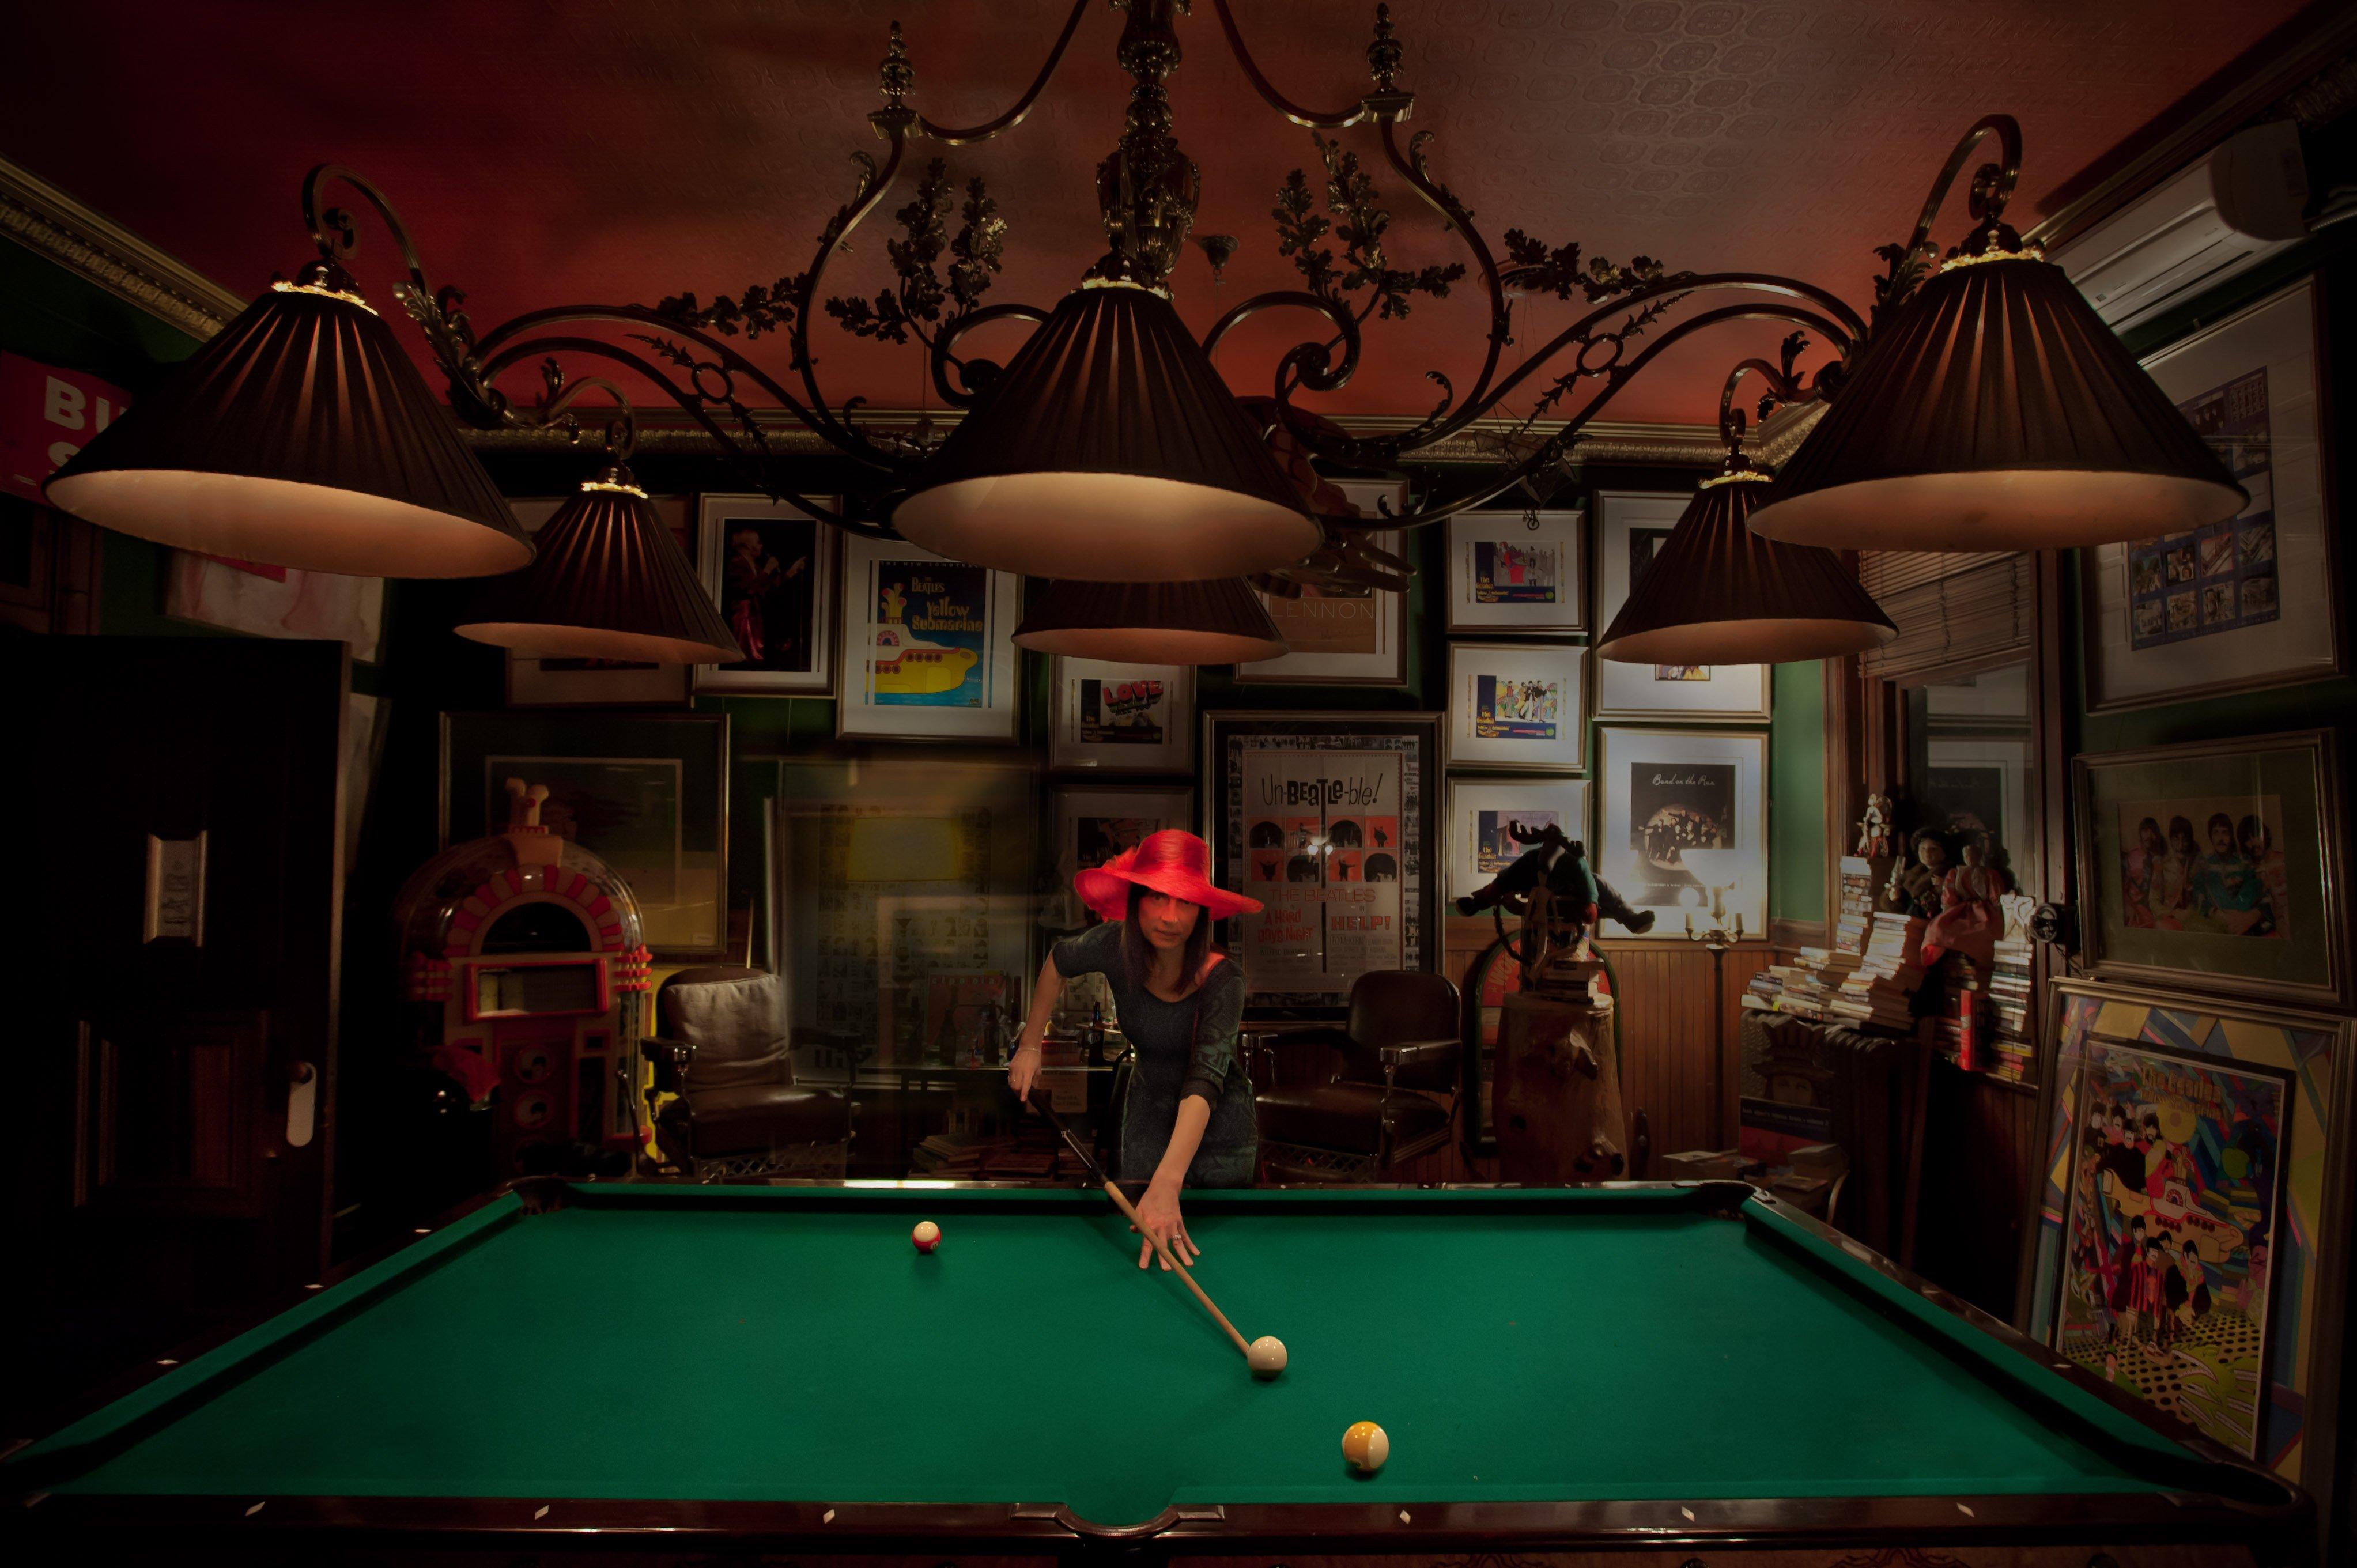 billiards, билья́рд, Dmitry Samoylin